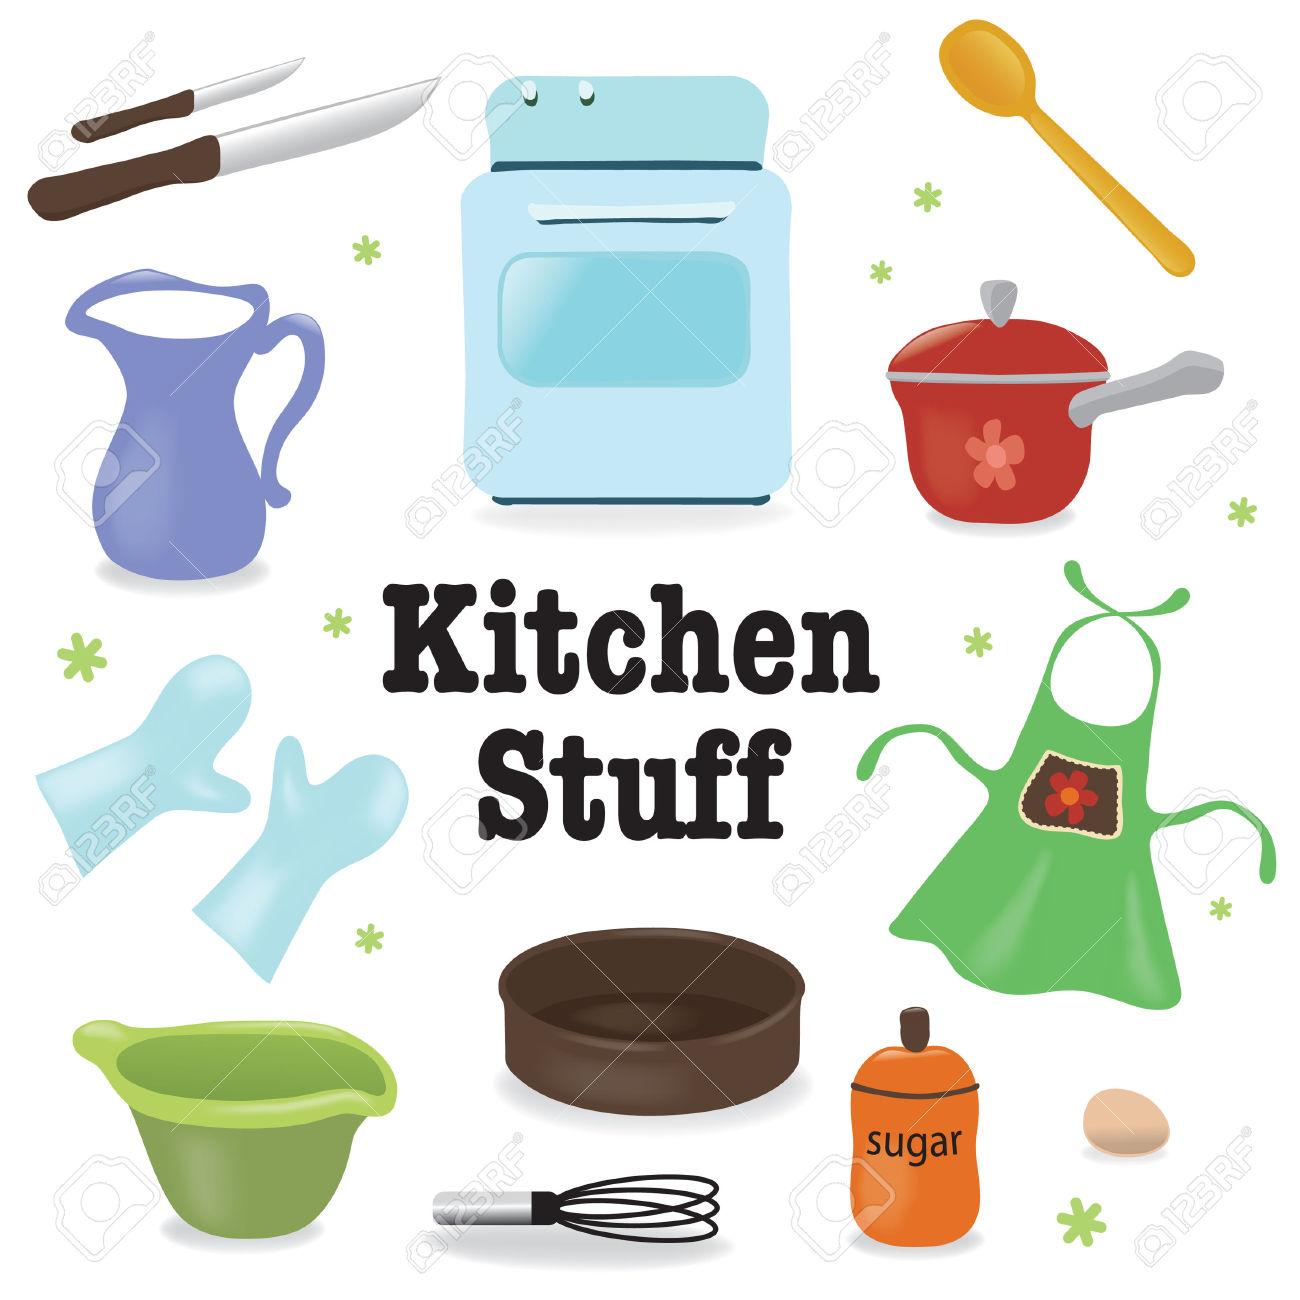 Kitchen stuff kitchen baking clipart panda free for Cosas de cocina